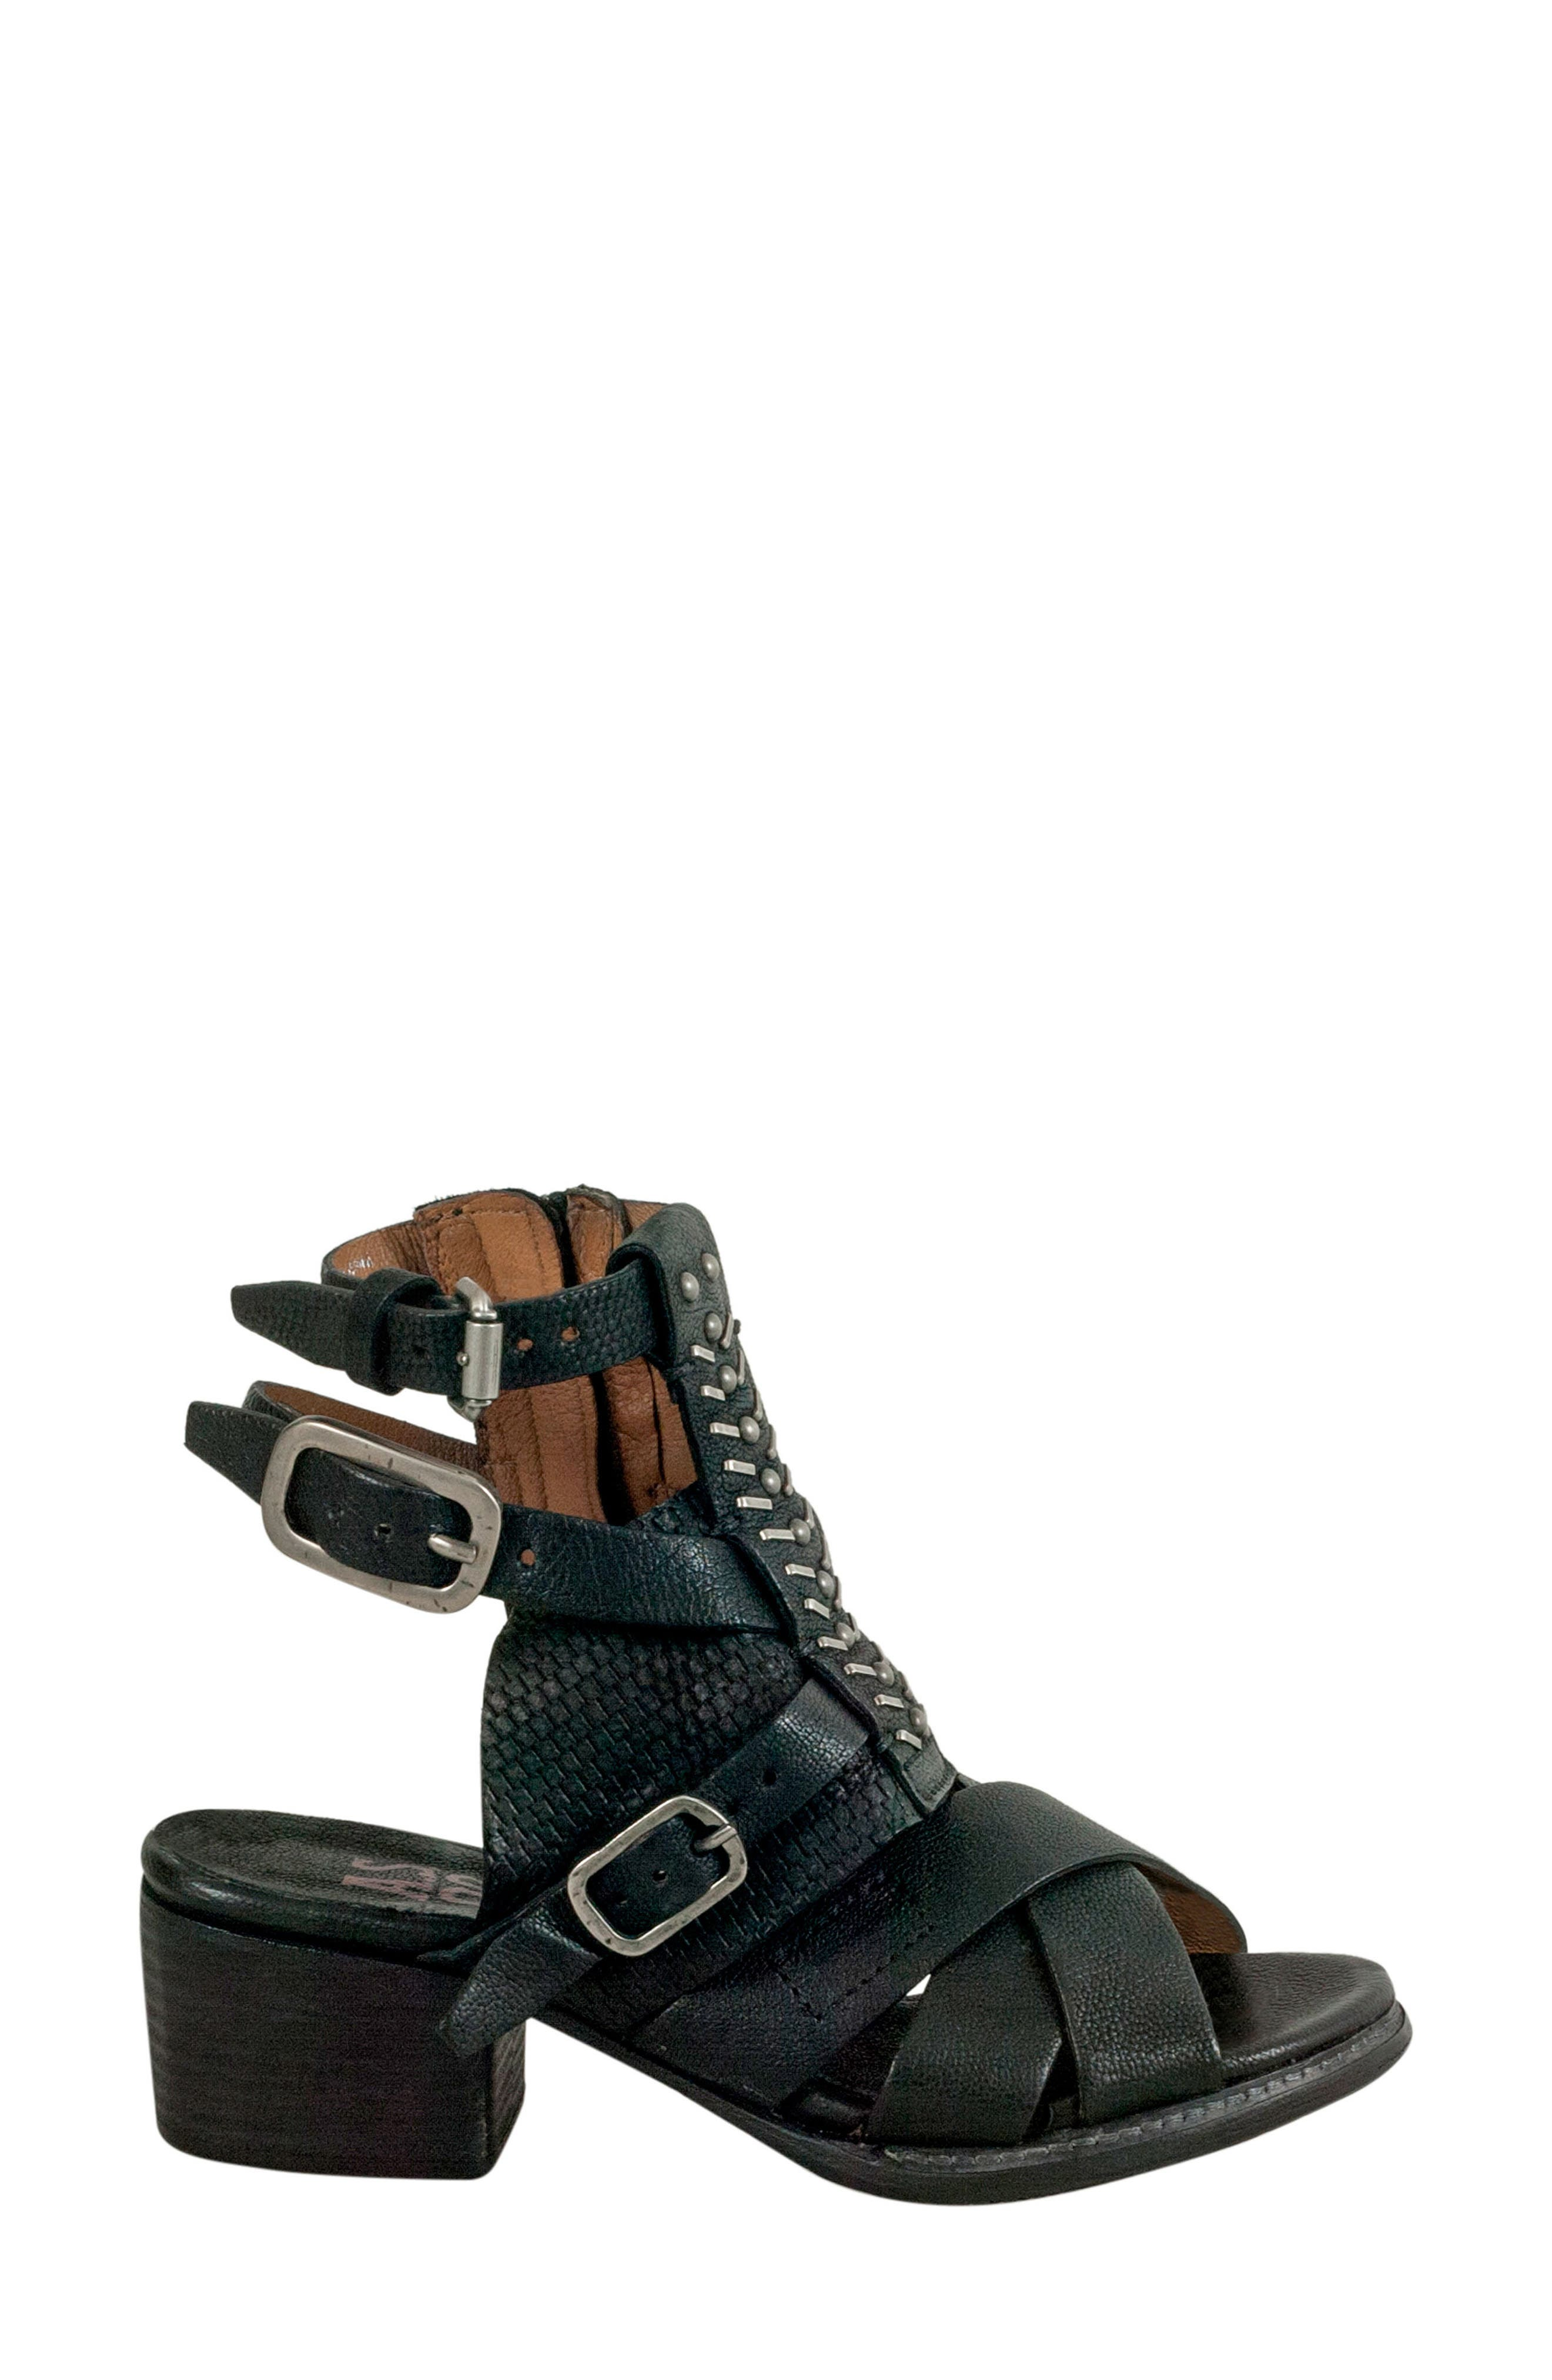 Pennie Gladiator Sandal,                             Alternate thumbnail 3, color,                             001